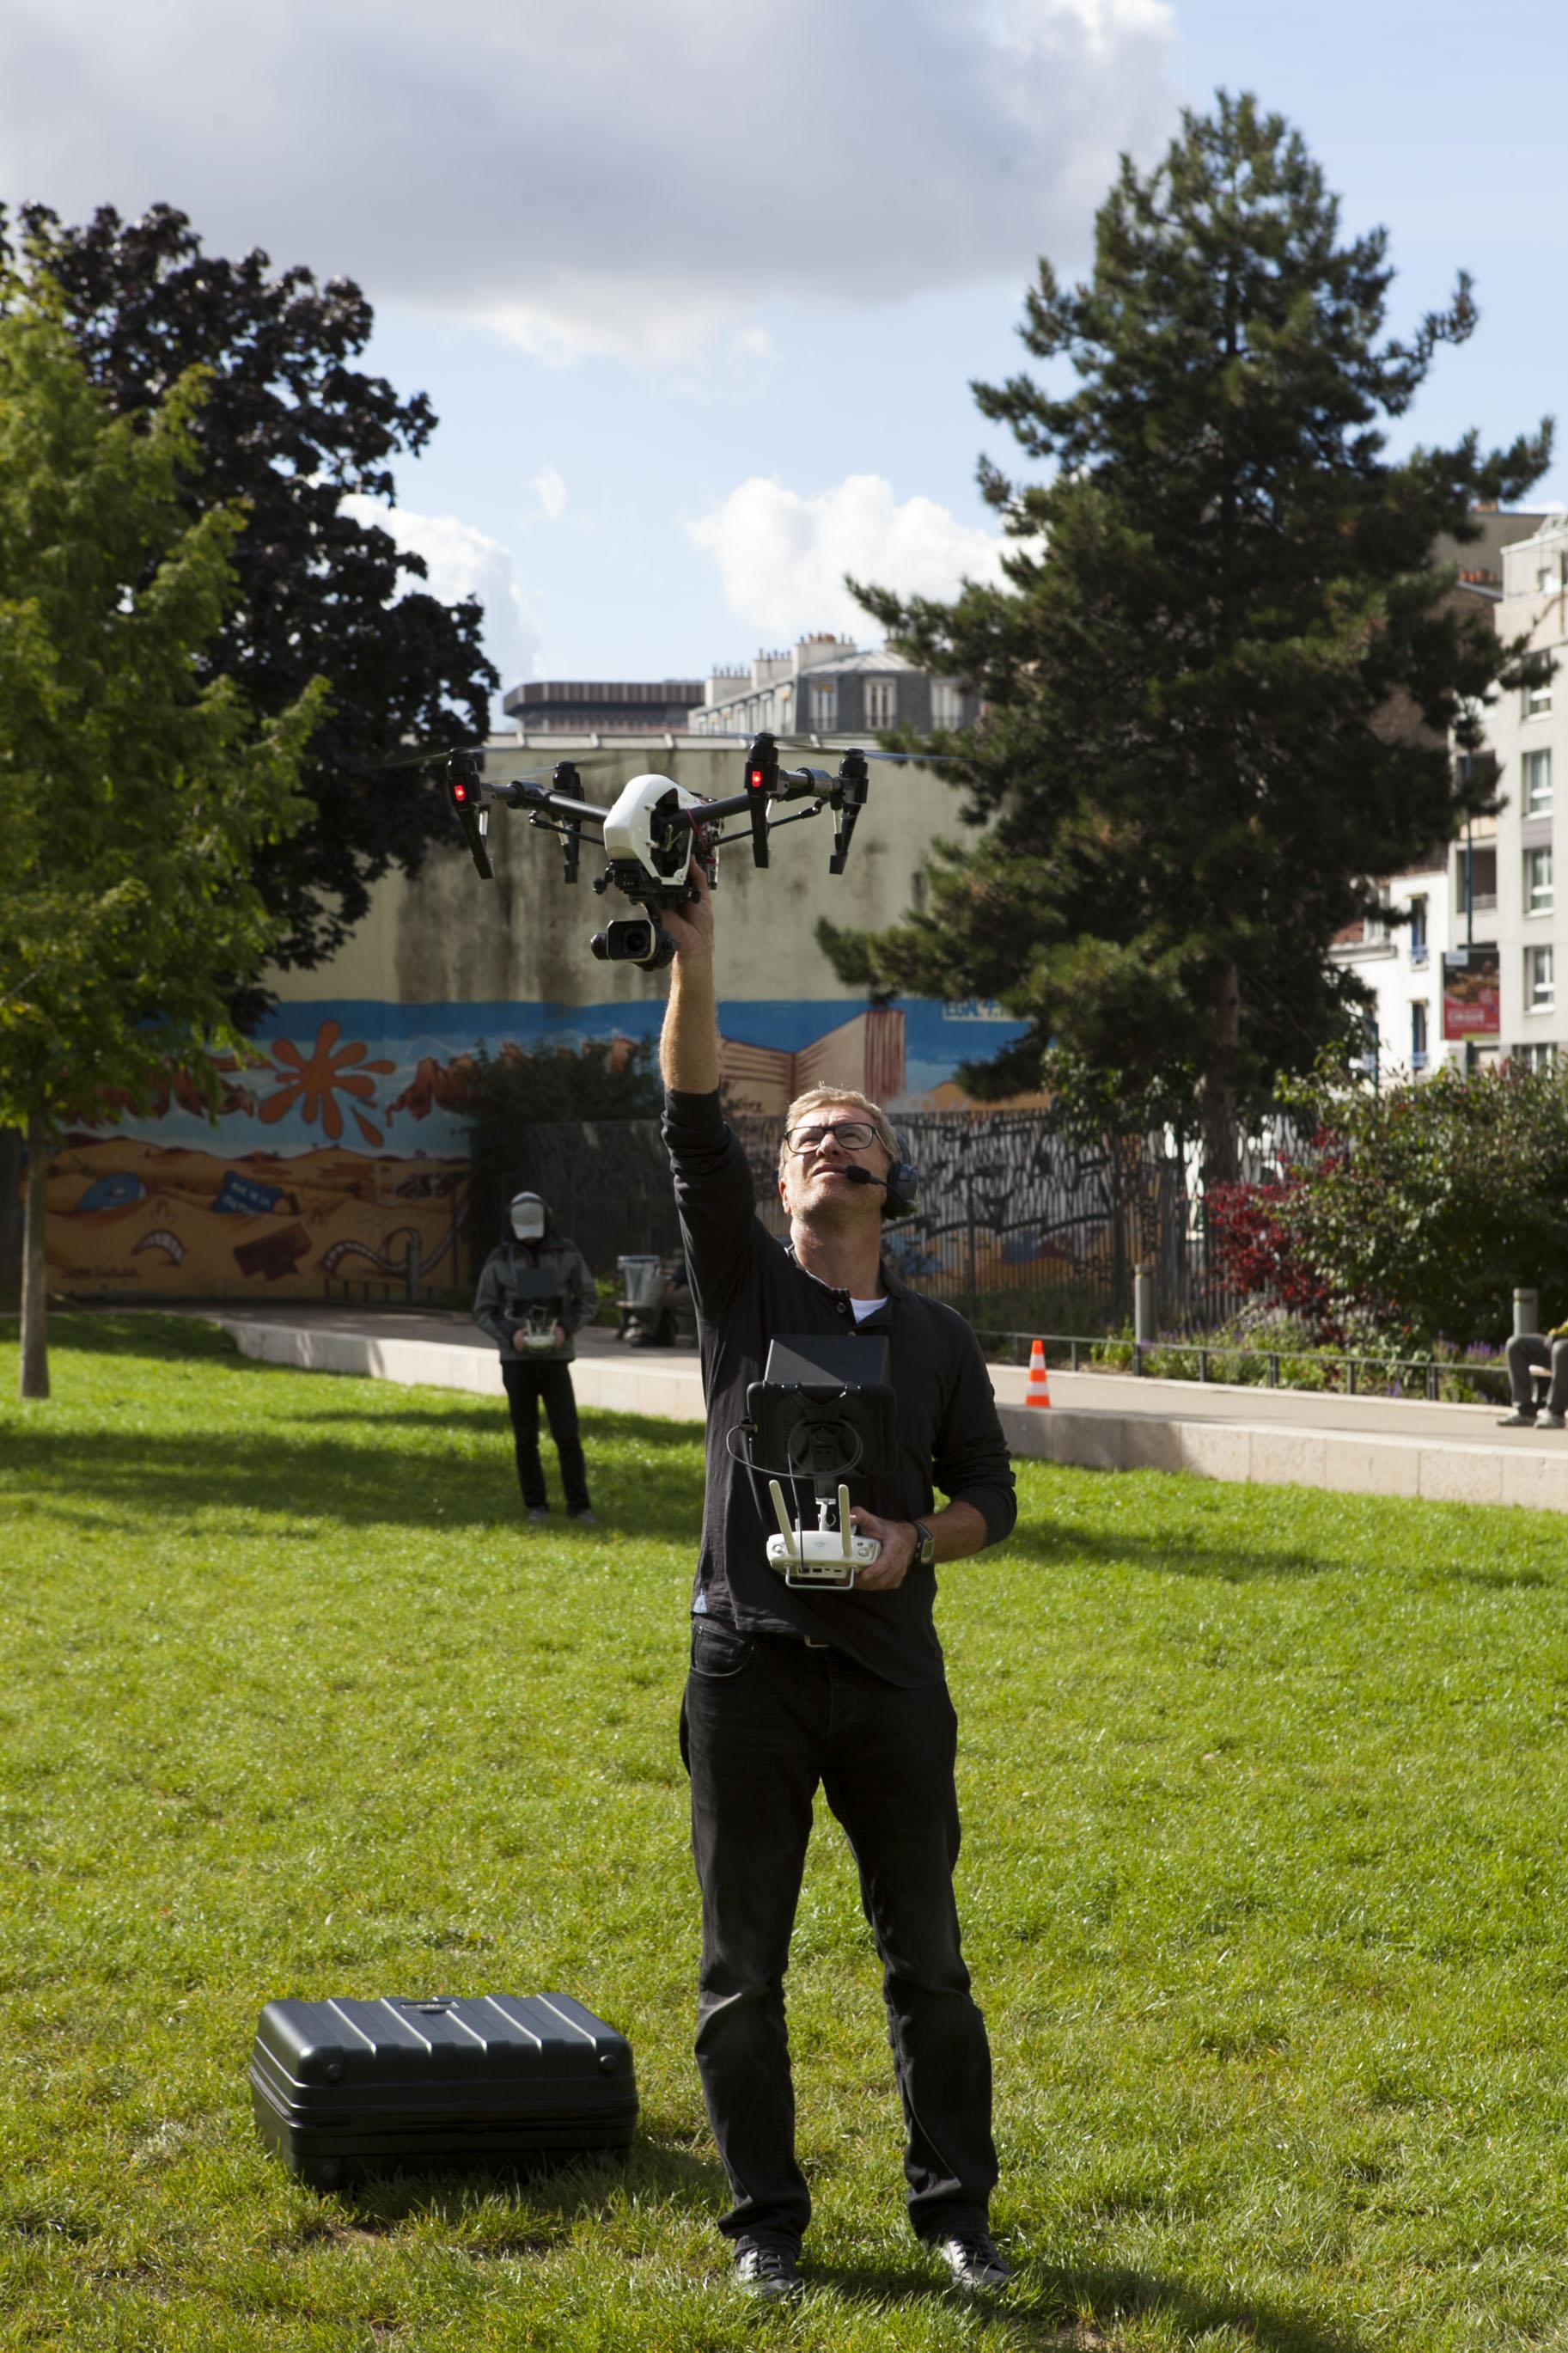 Shooting of 40 sites for EST ENSEMBLE (93) by D COM DRONE